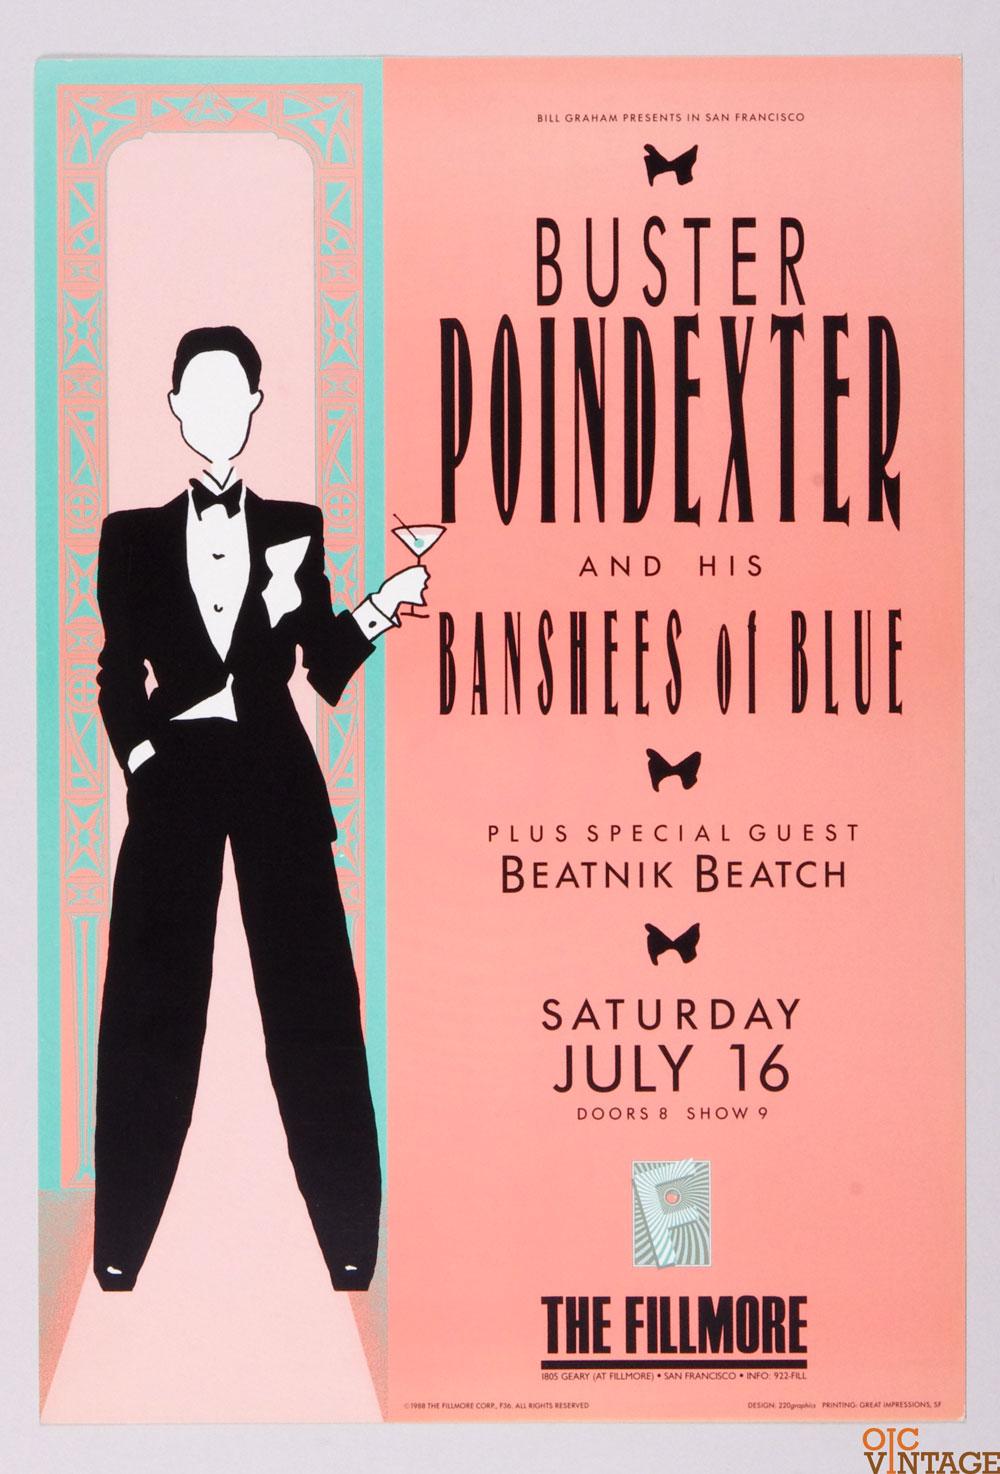 New Fillmore F036 Poster Buster Poindexter Beatnik Beatch 1988 Jul 16